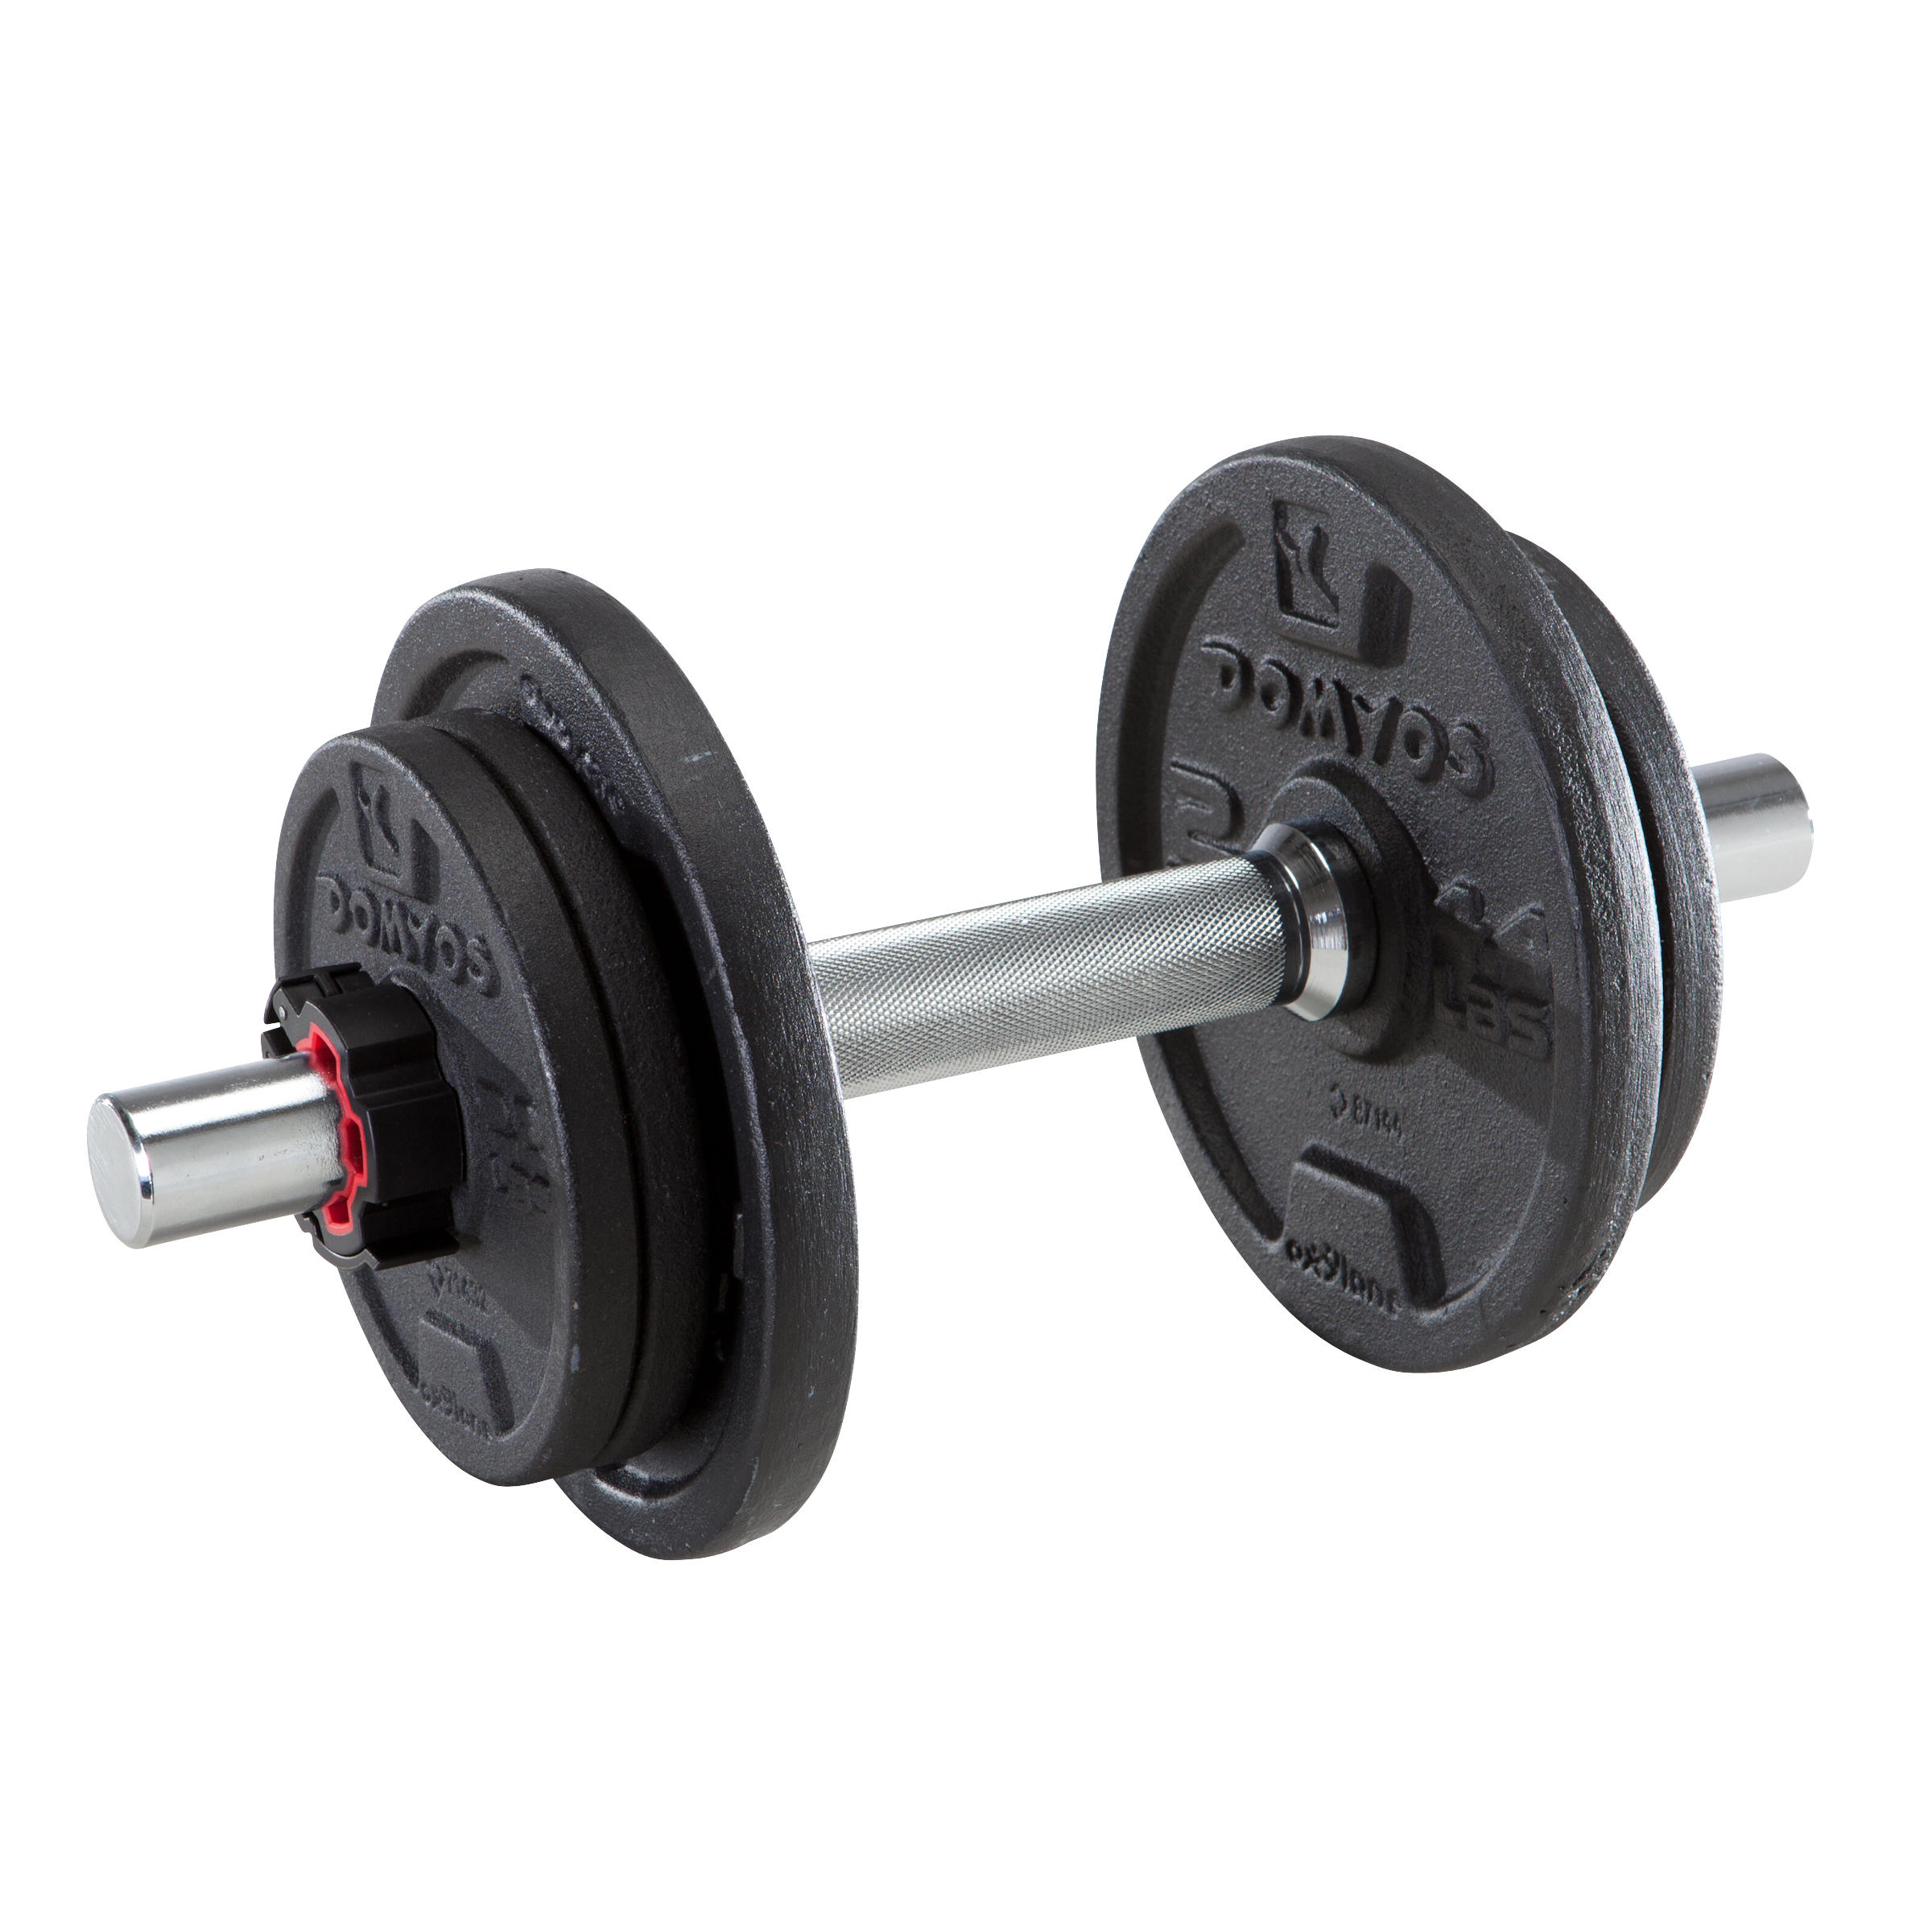 10 kg Weight Training Dumbbells Set